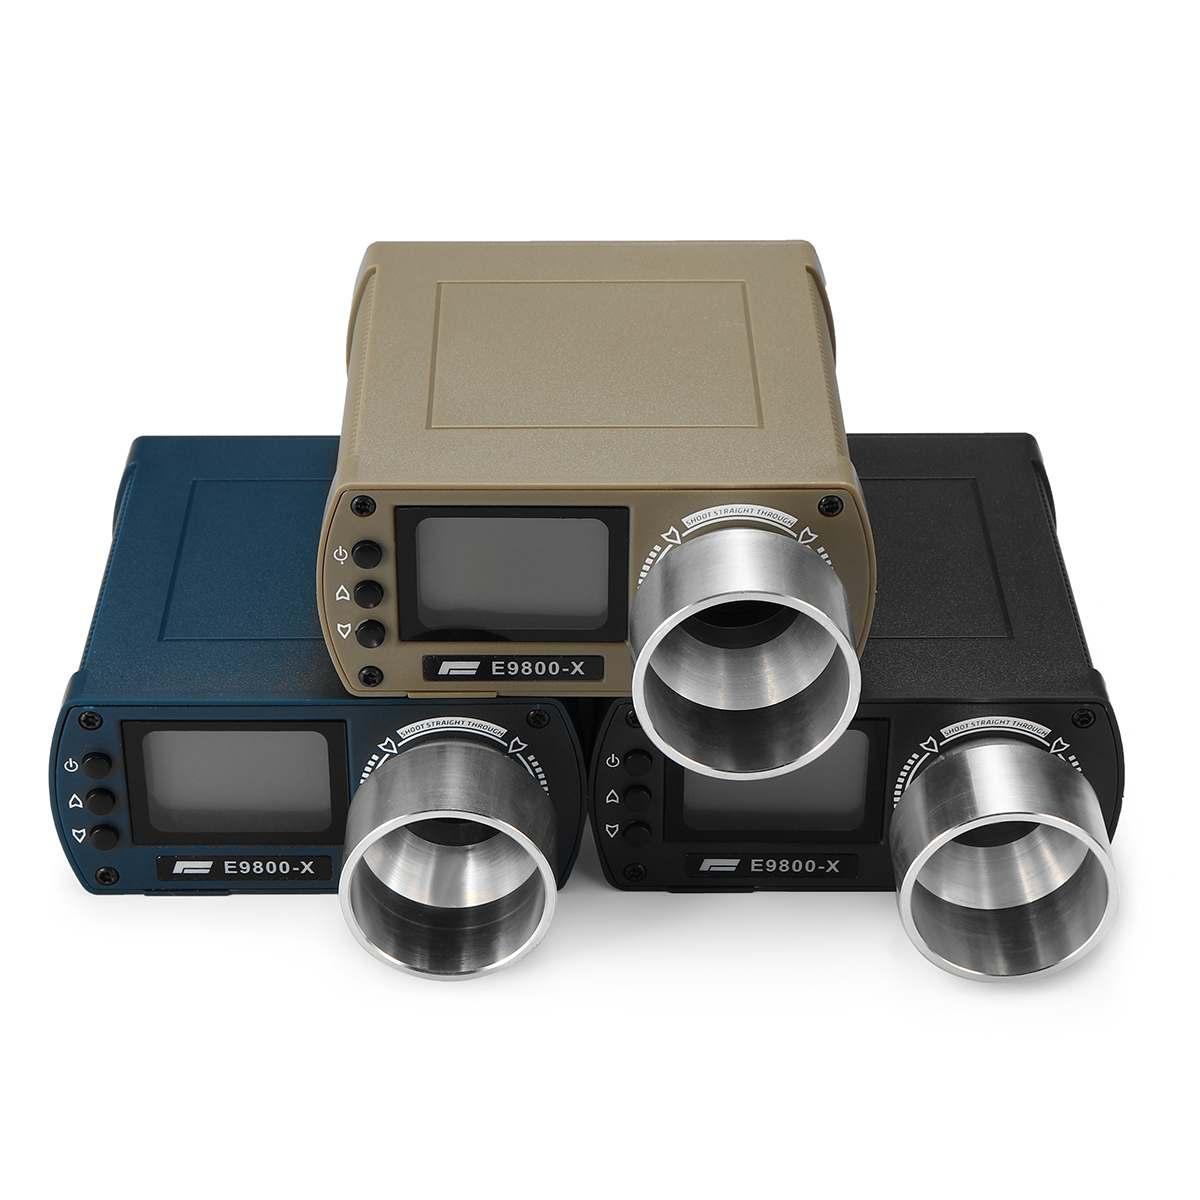 Shooting Chronograph Speed Tester E9800-X Chrono Airsoft BB Hunting Tool US